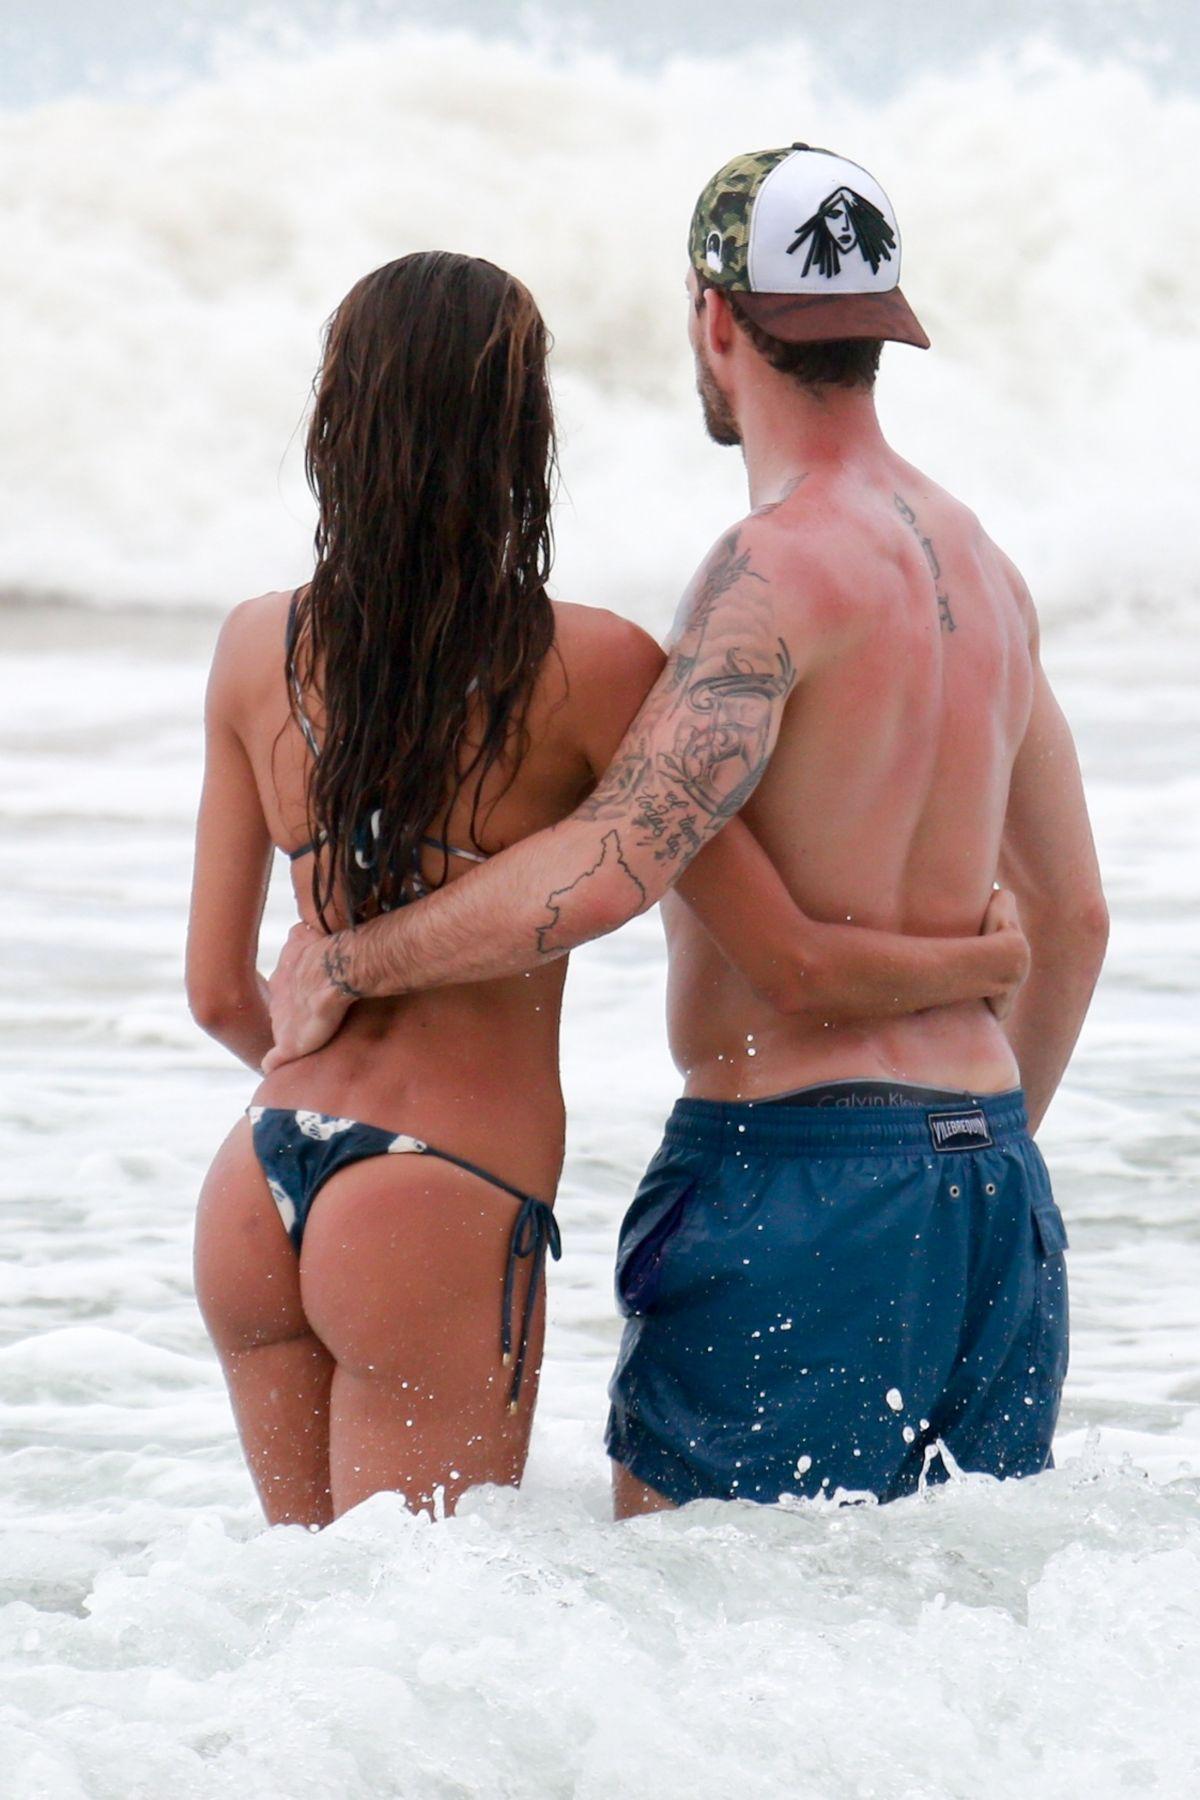 Izabel Goulart in Bikini and Kevin Trapp on the beach in Fernando de Noronha Pic 17 of 35